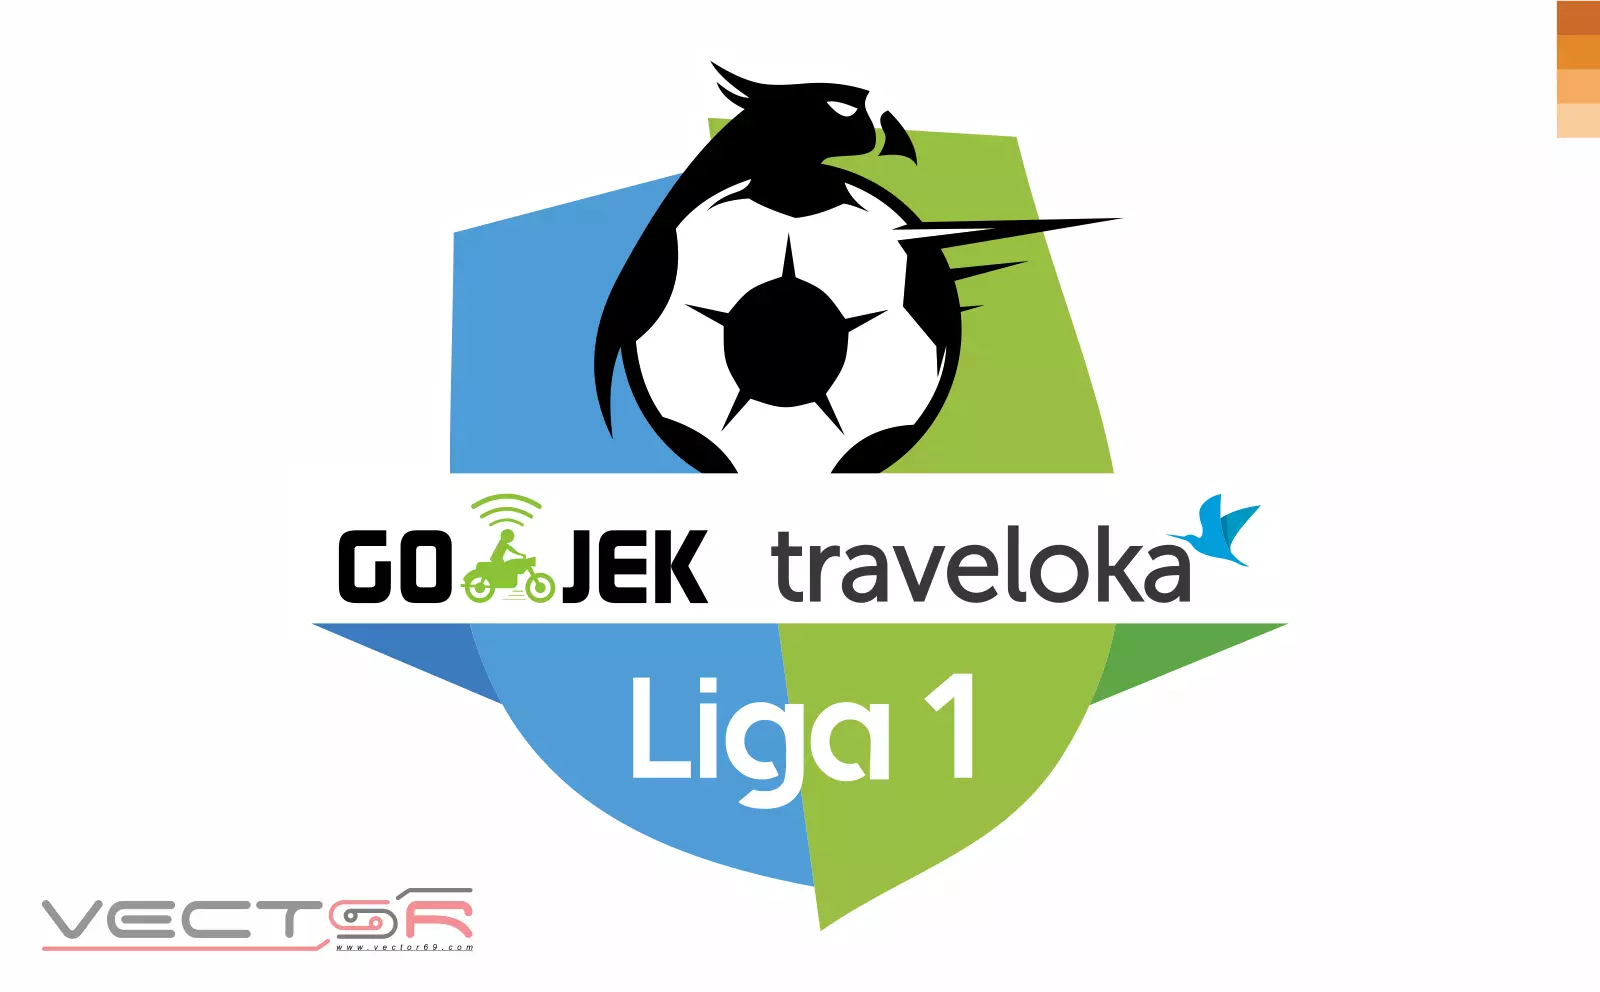 Gojek Traveloka Liga 1 Indonesia Logo - Download Vector File AI (Adobe Illustrator)